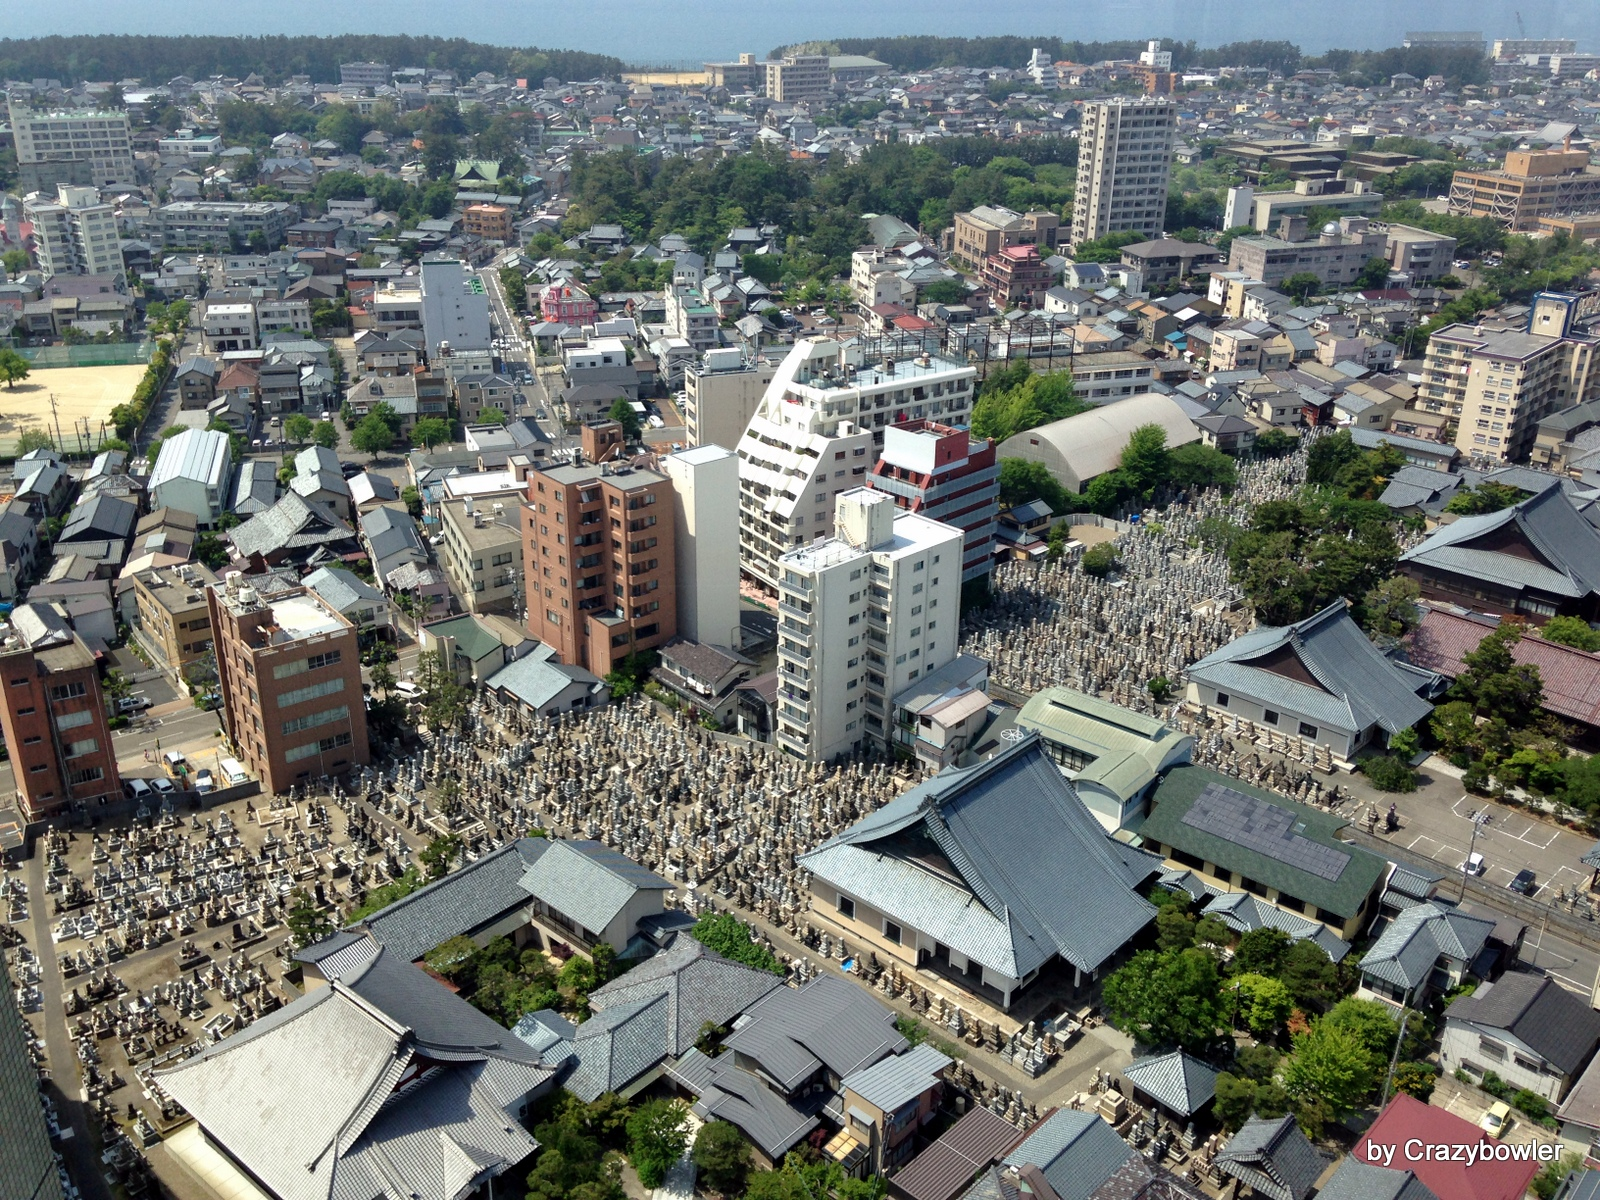 101mから見る浄泉寺と本覚寺の墓地群